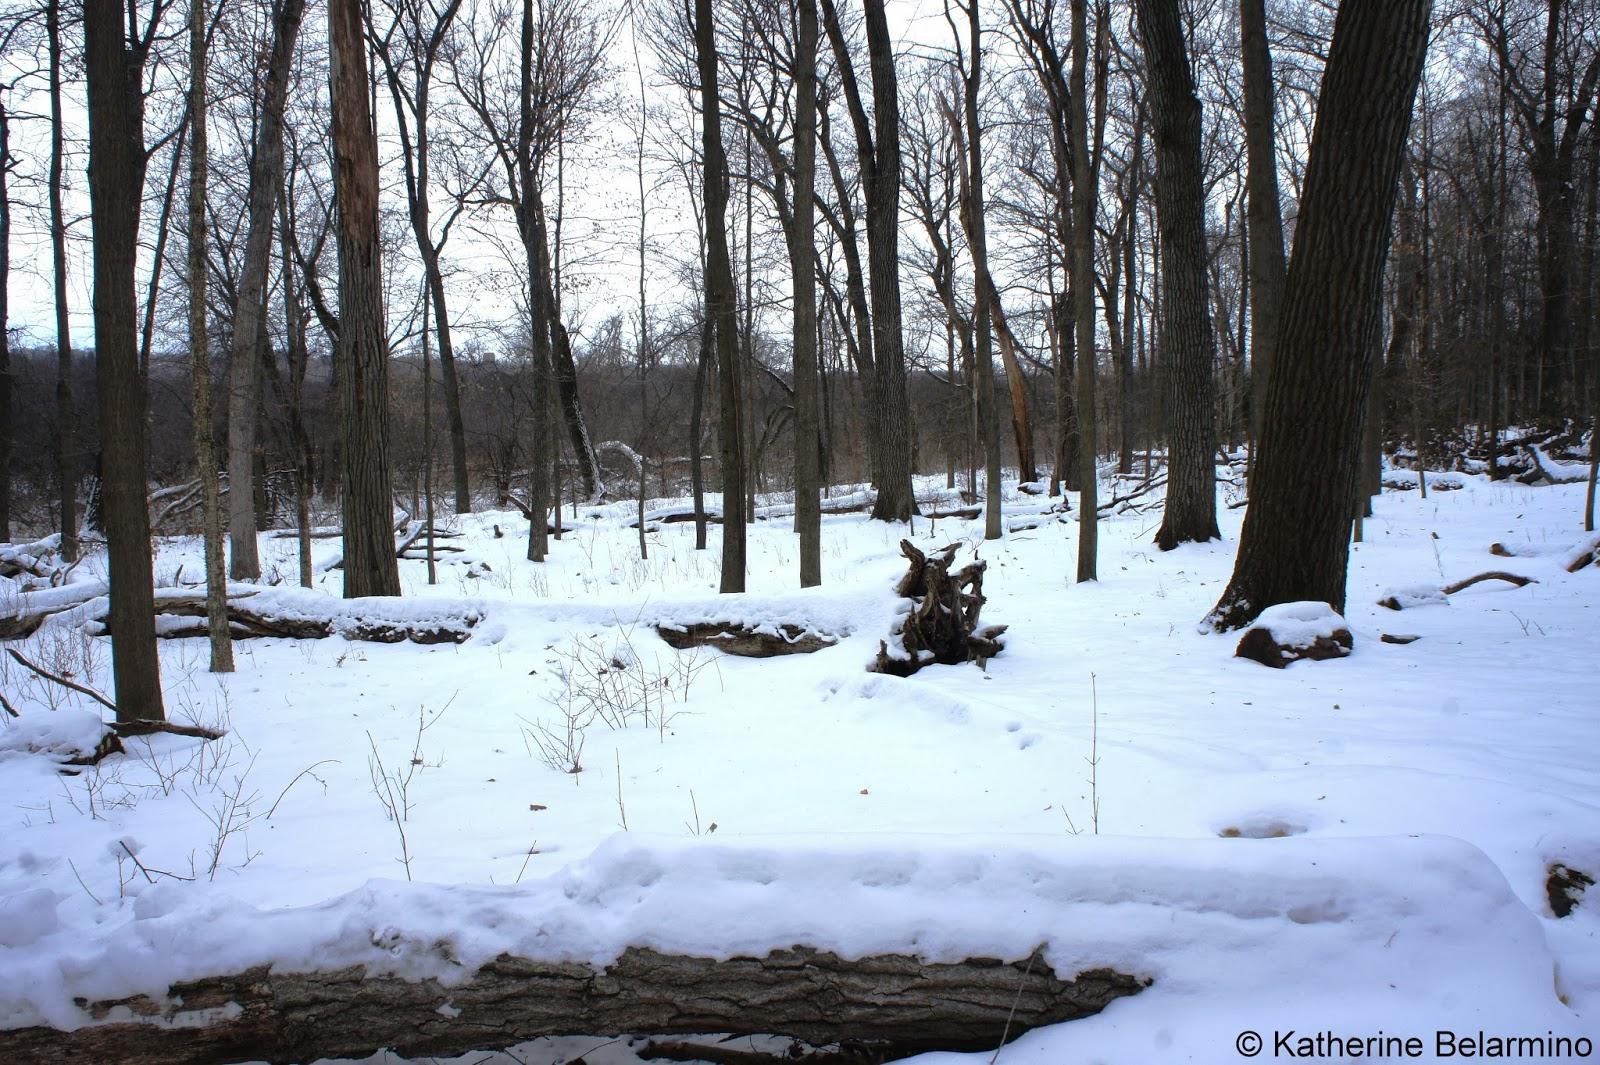 University of Wisconsin-Madison Arboretum